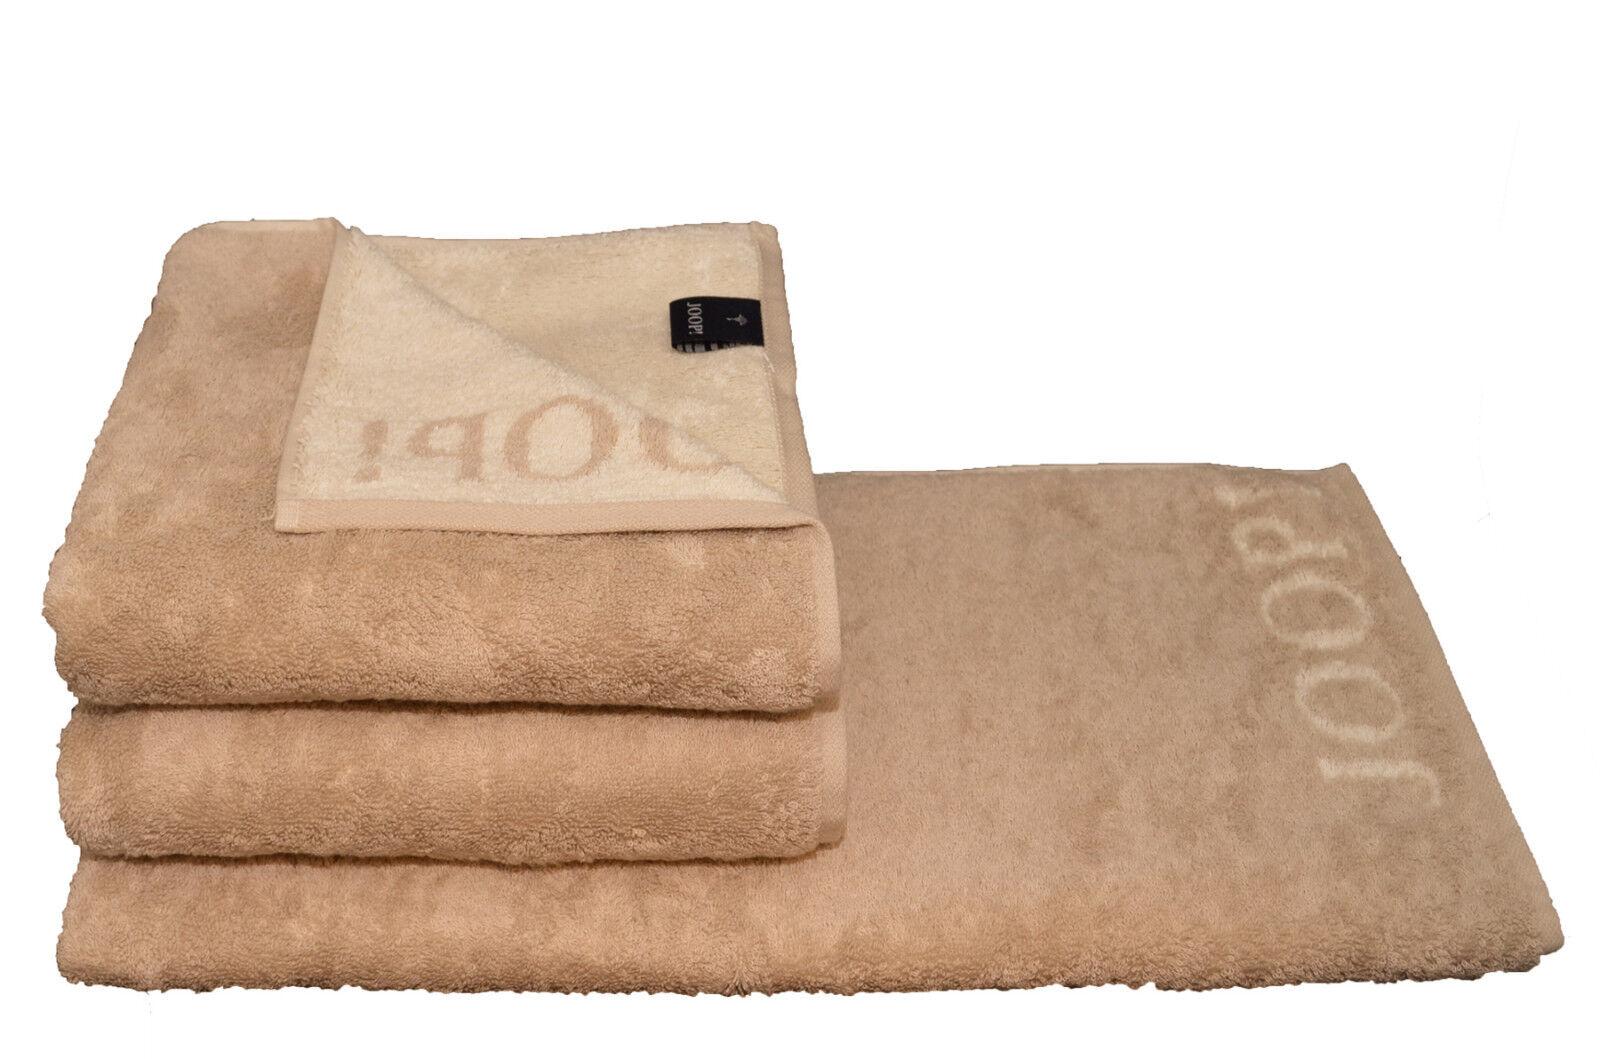 Joop  Classic Classic Classic 1600 sabbia 30 sauna Panno ASCIUGAMANO ASCIUGAMANI duschtuch acquisto online 6eed3e